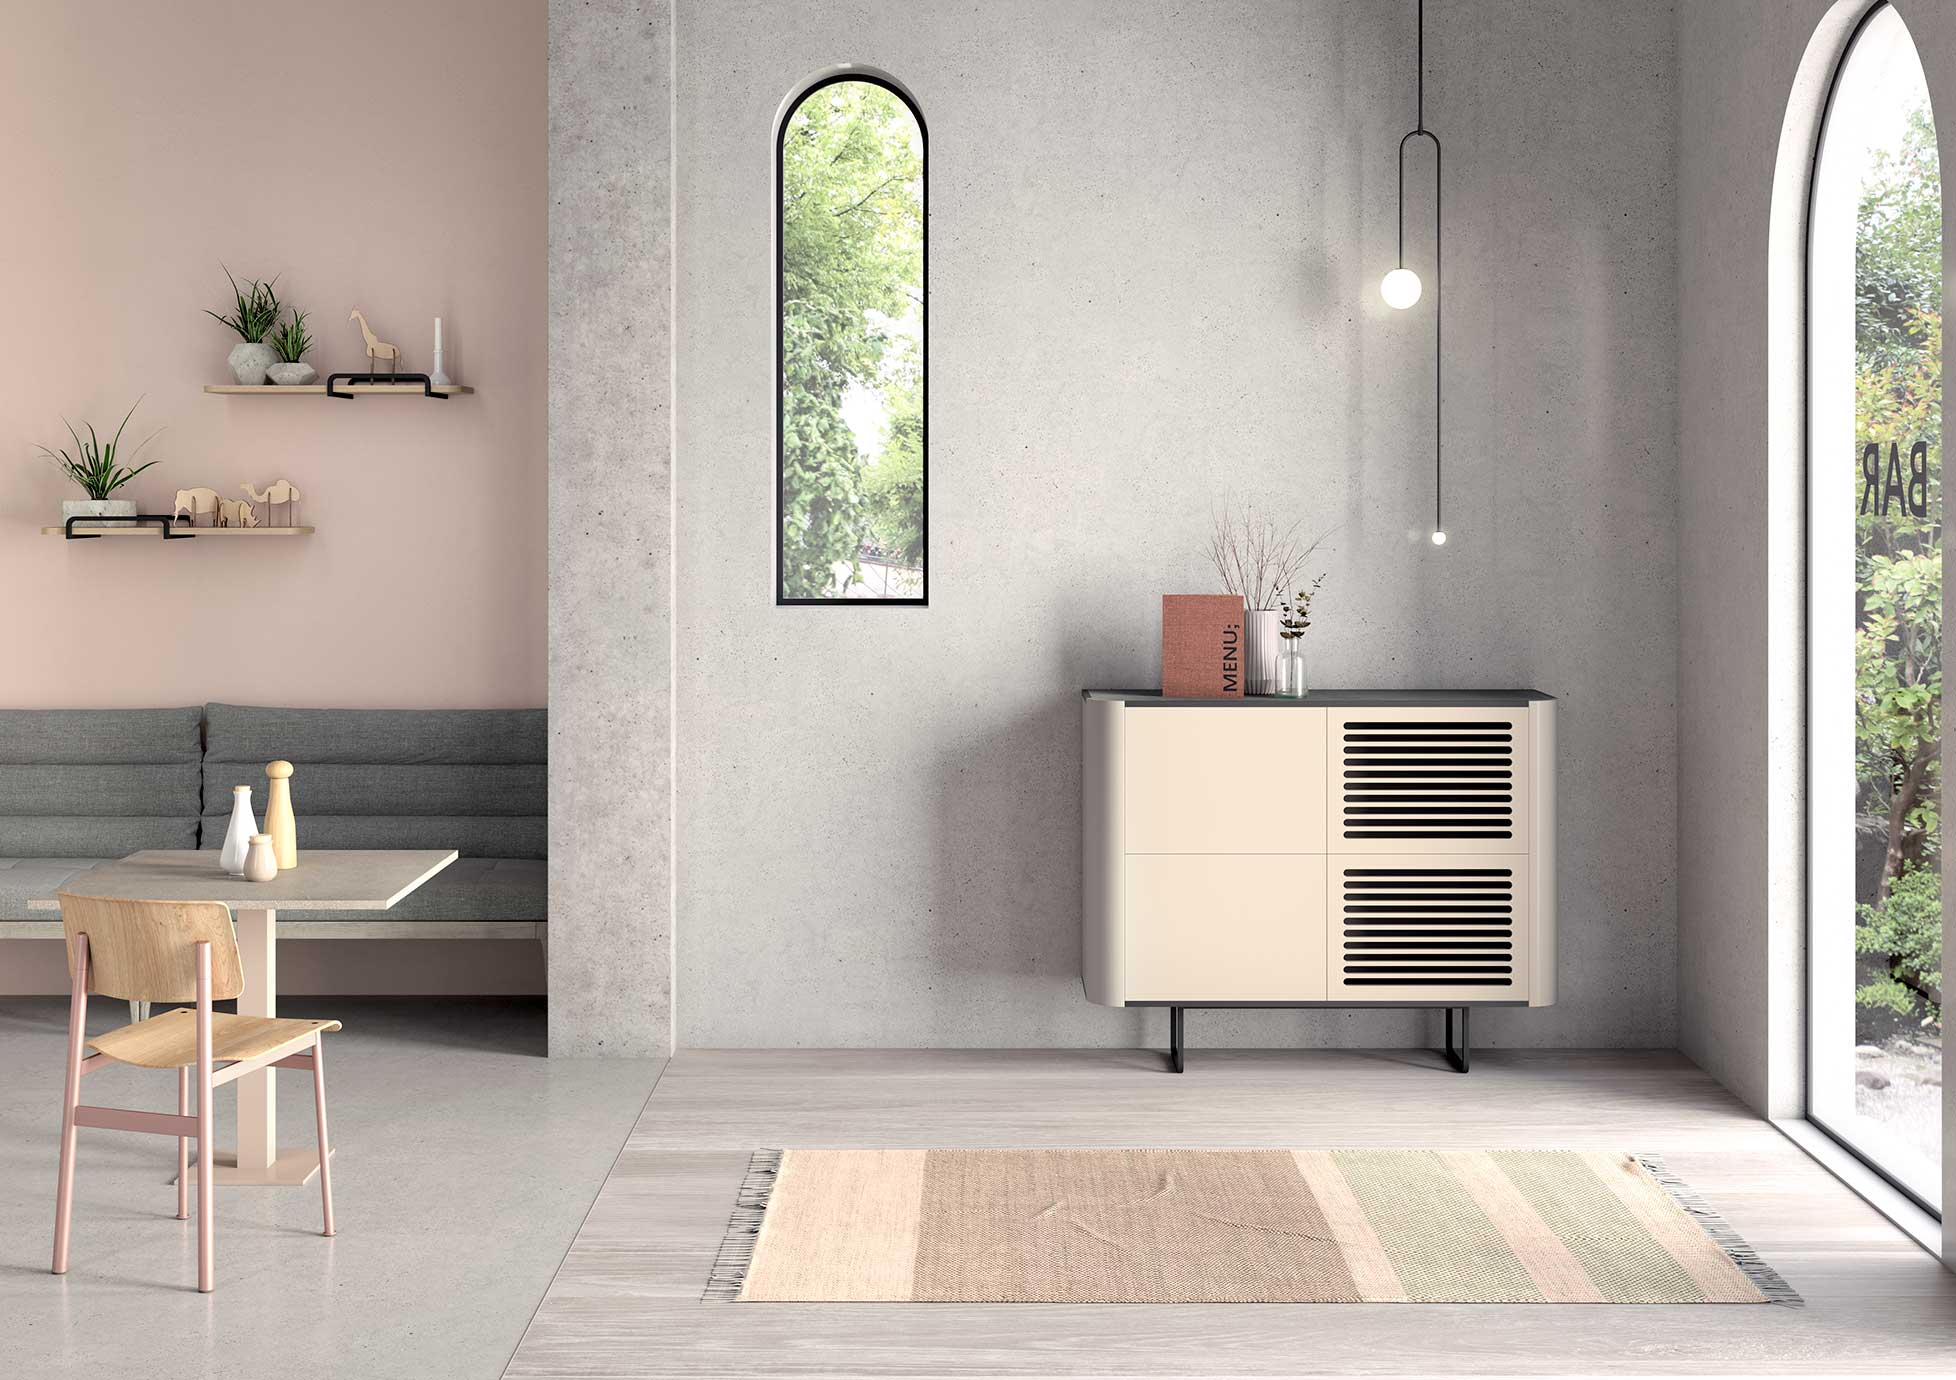 Colección Adara - Mueble Apilado con puerta ranurada